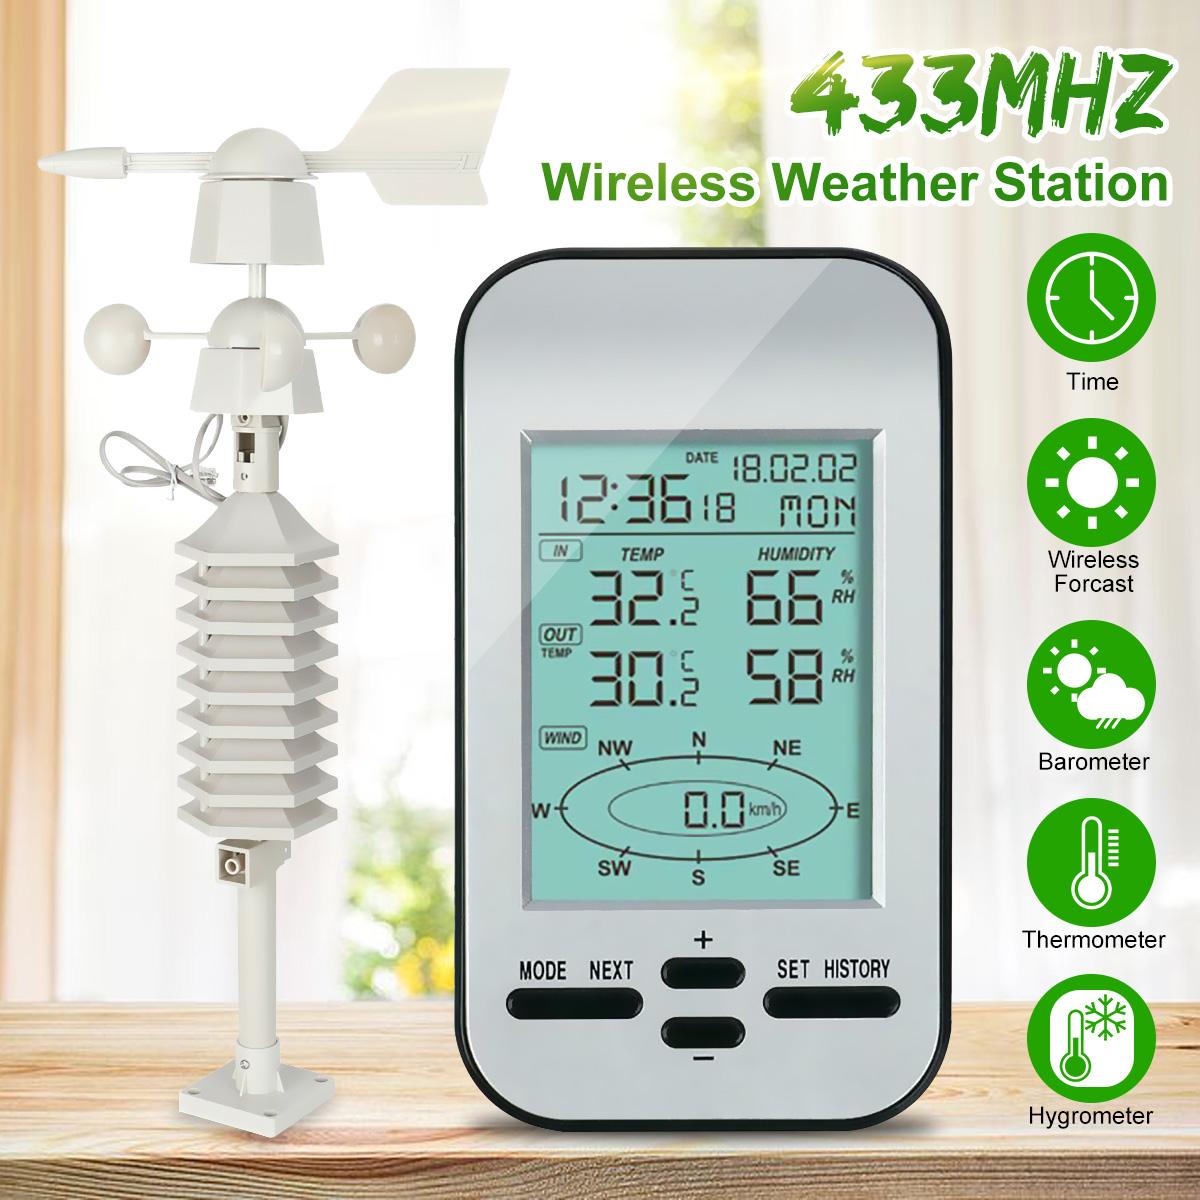 Rf 433mhz Wireless Weather Station Clock With Wind Speed